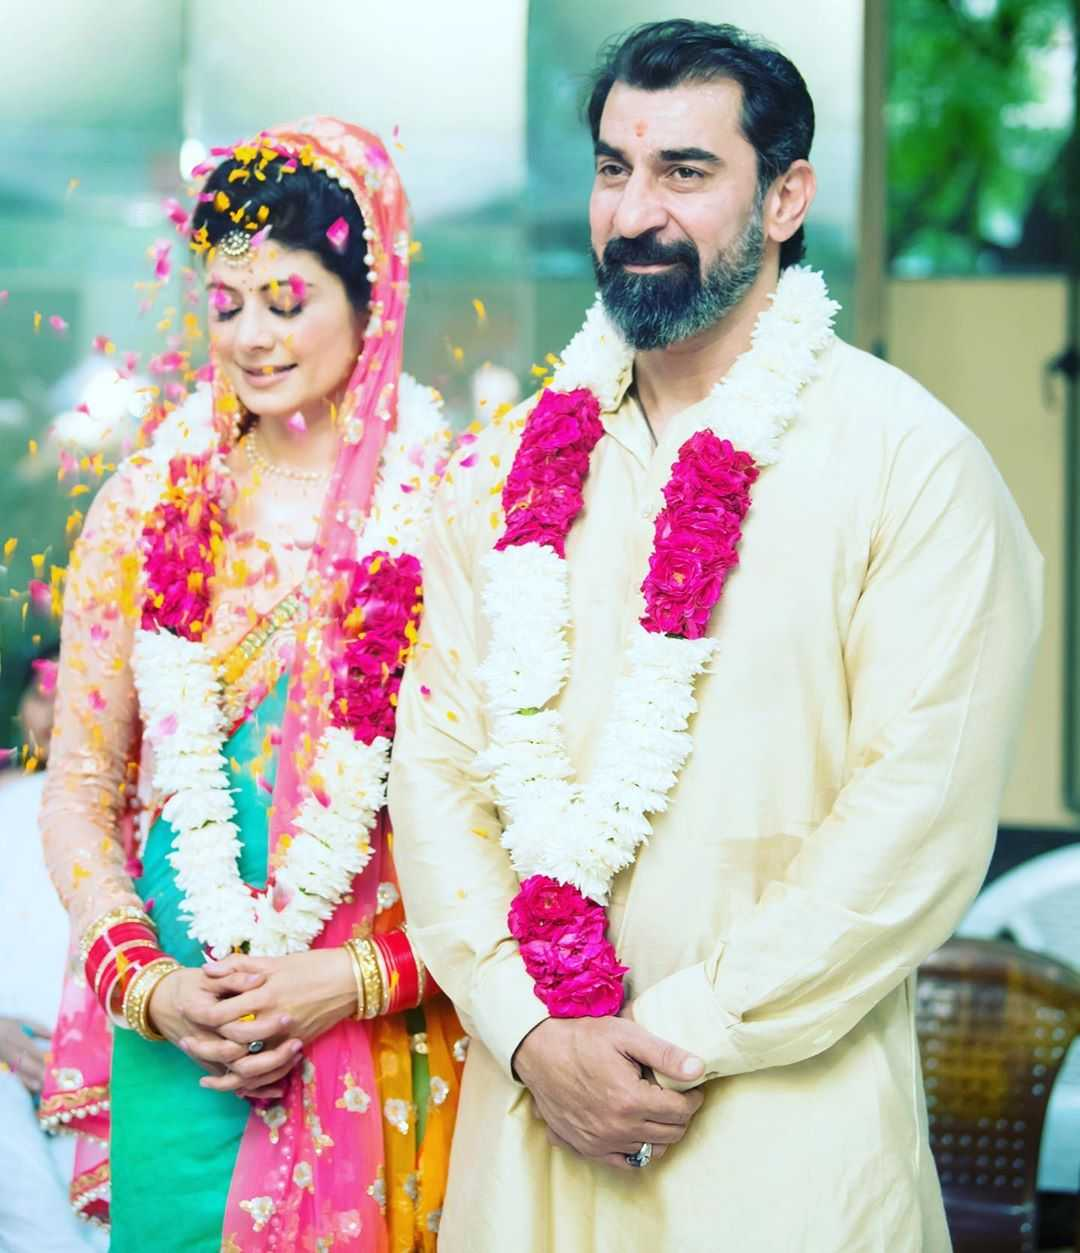 Pooja Batra Nawab Shah wedding pictures